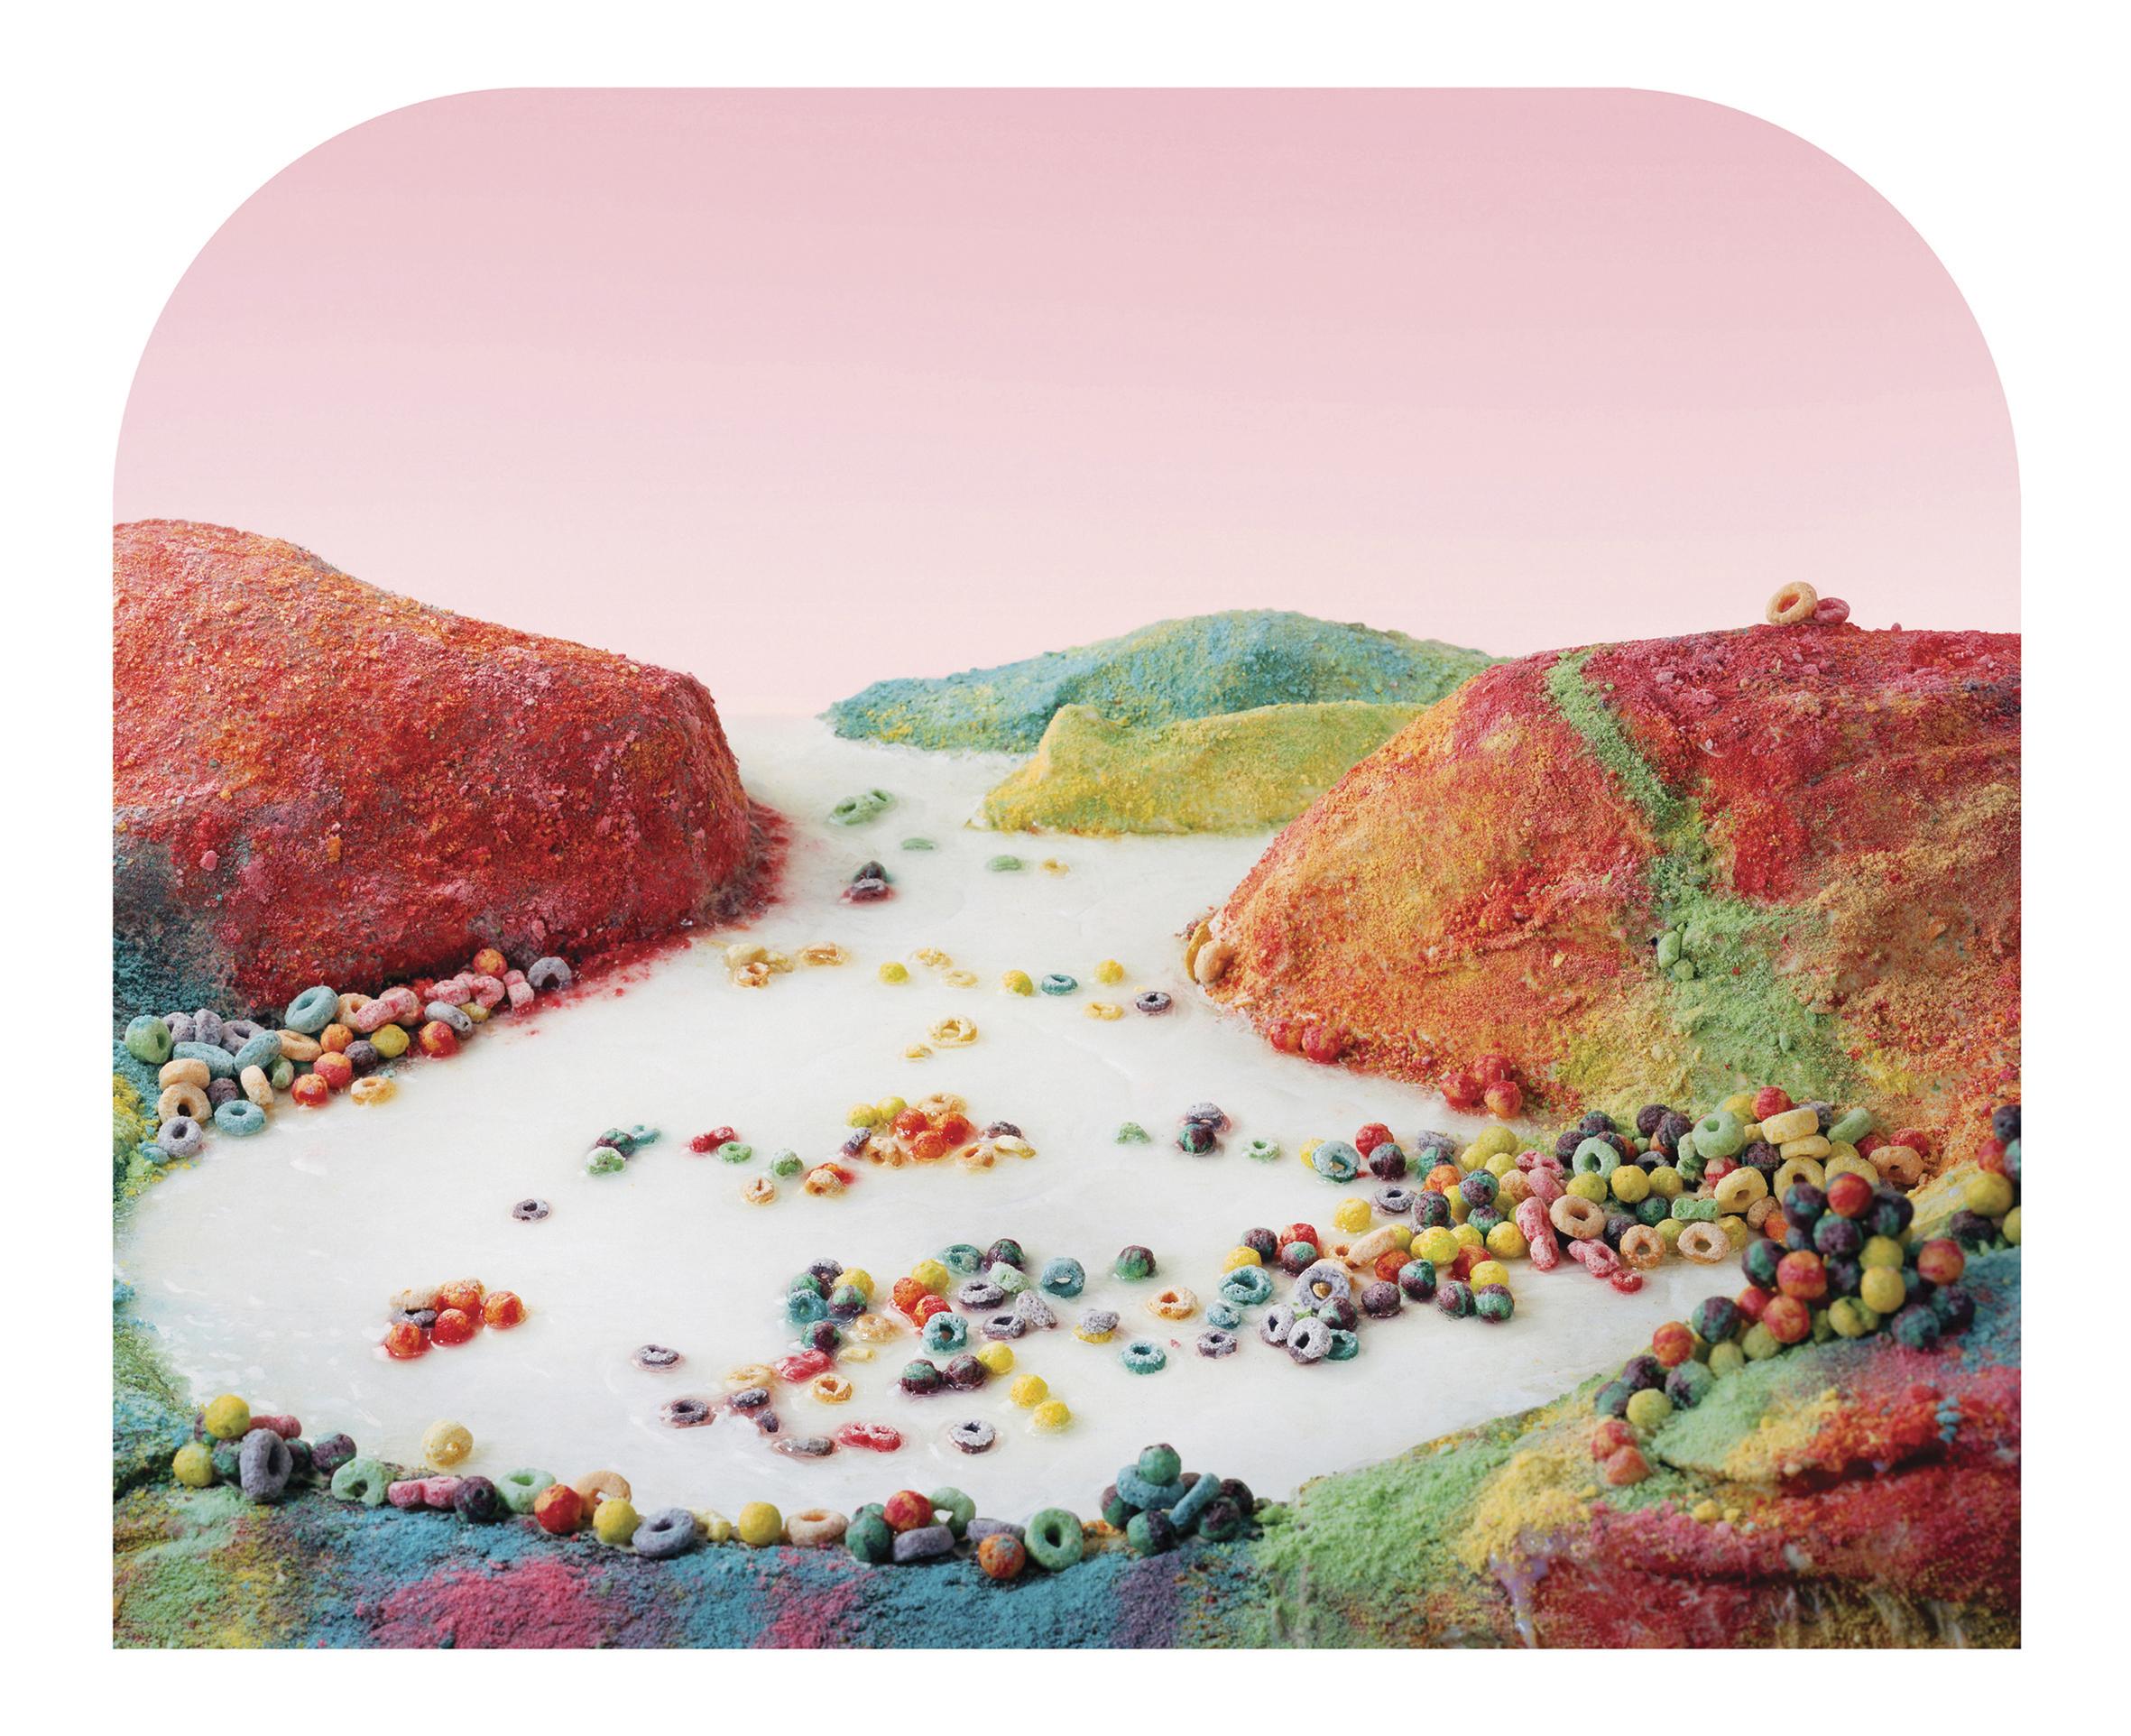 Fruit Loops Landscape © Barbara Ciurej & Lindsay Lochman